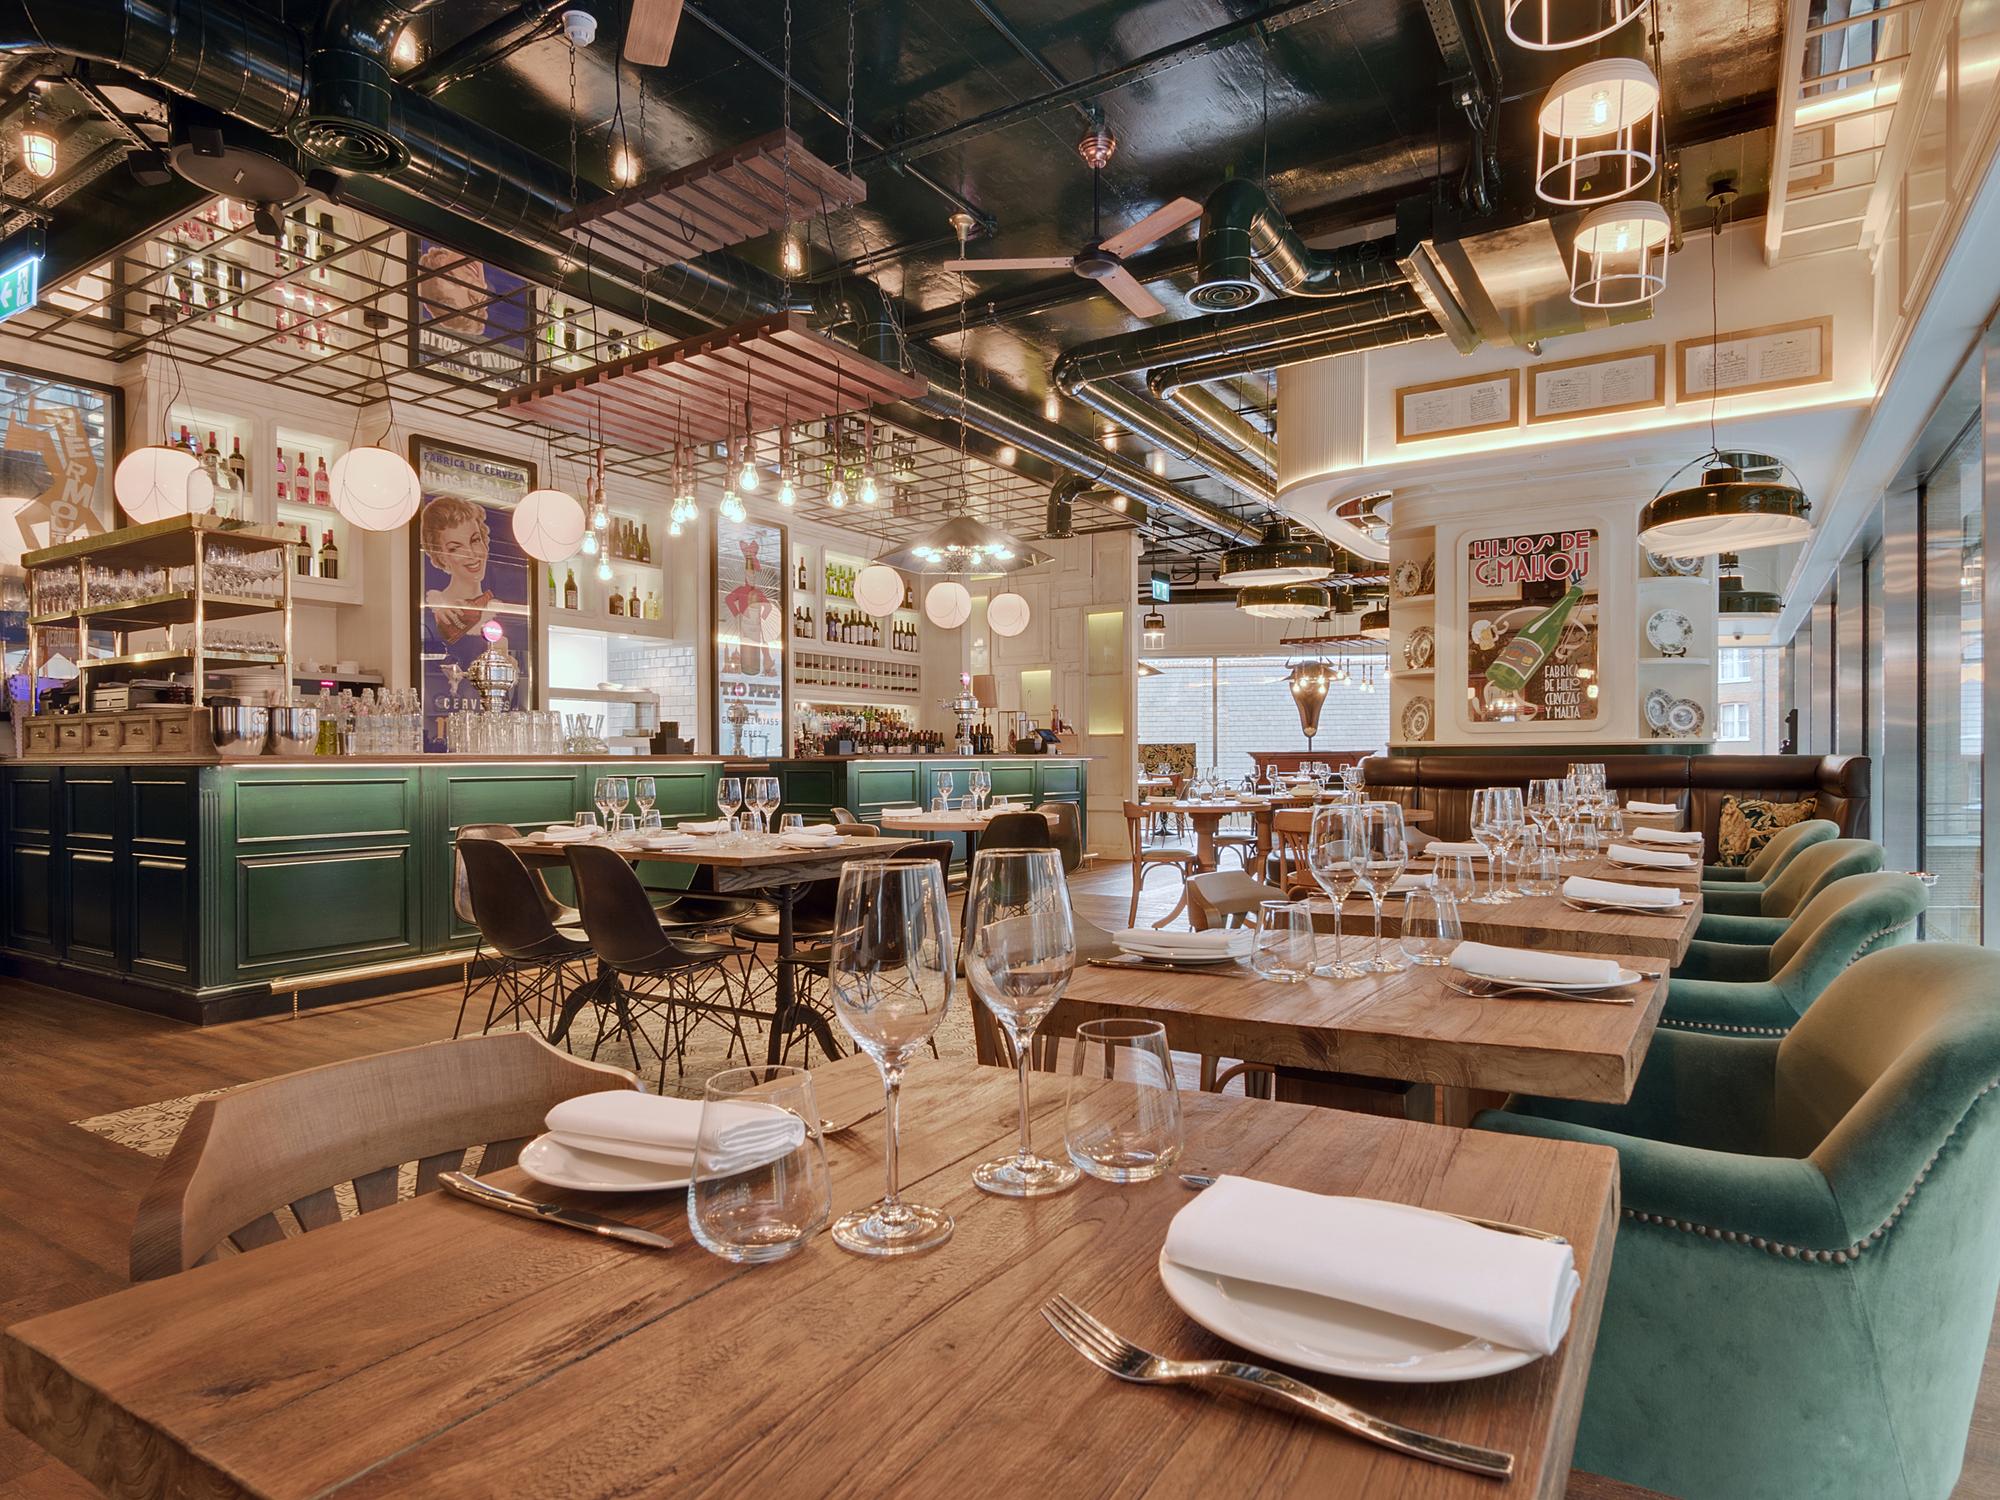 restaurant design iberica (victoria, london, uk) / lazaro rosa violan studio . image courtesy LBDDFGX